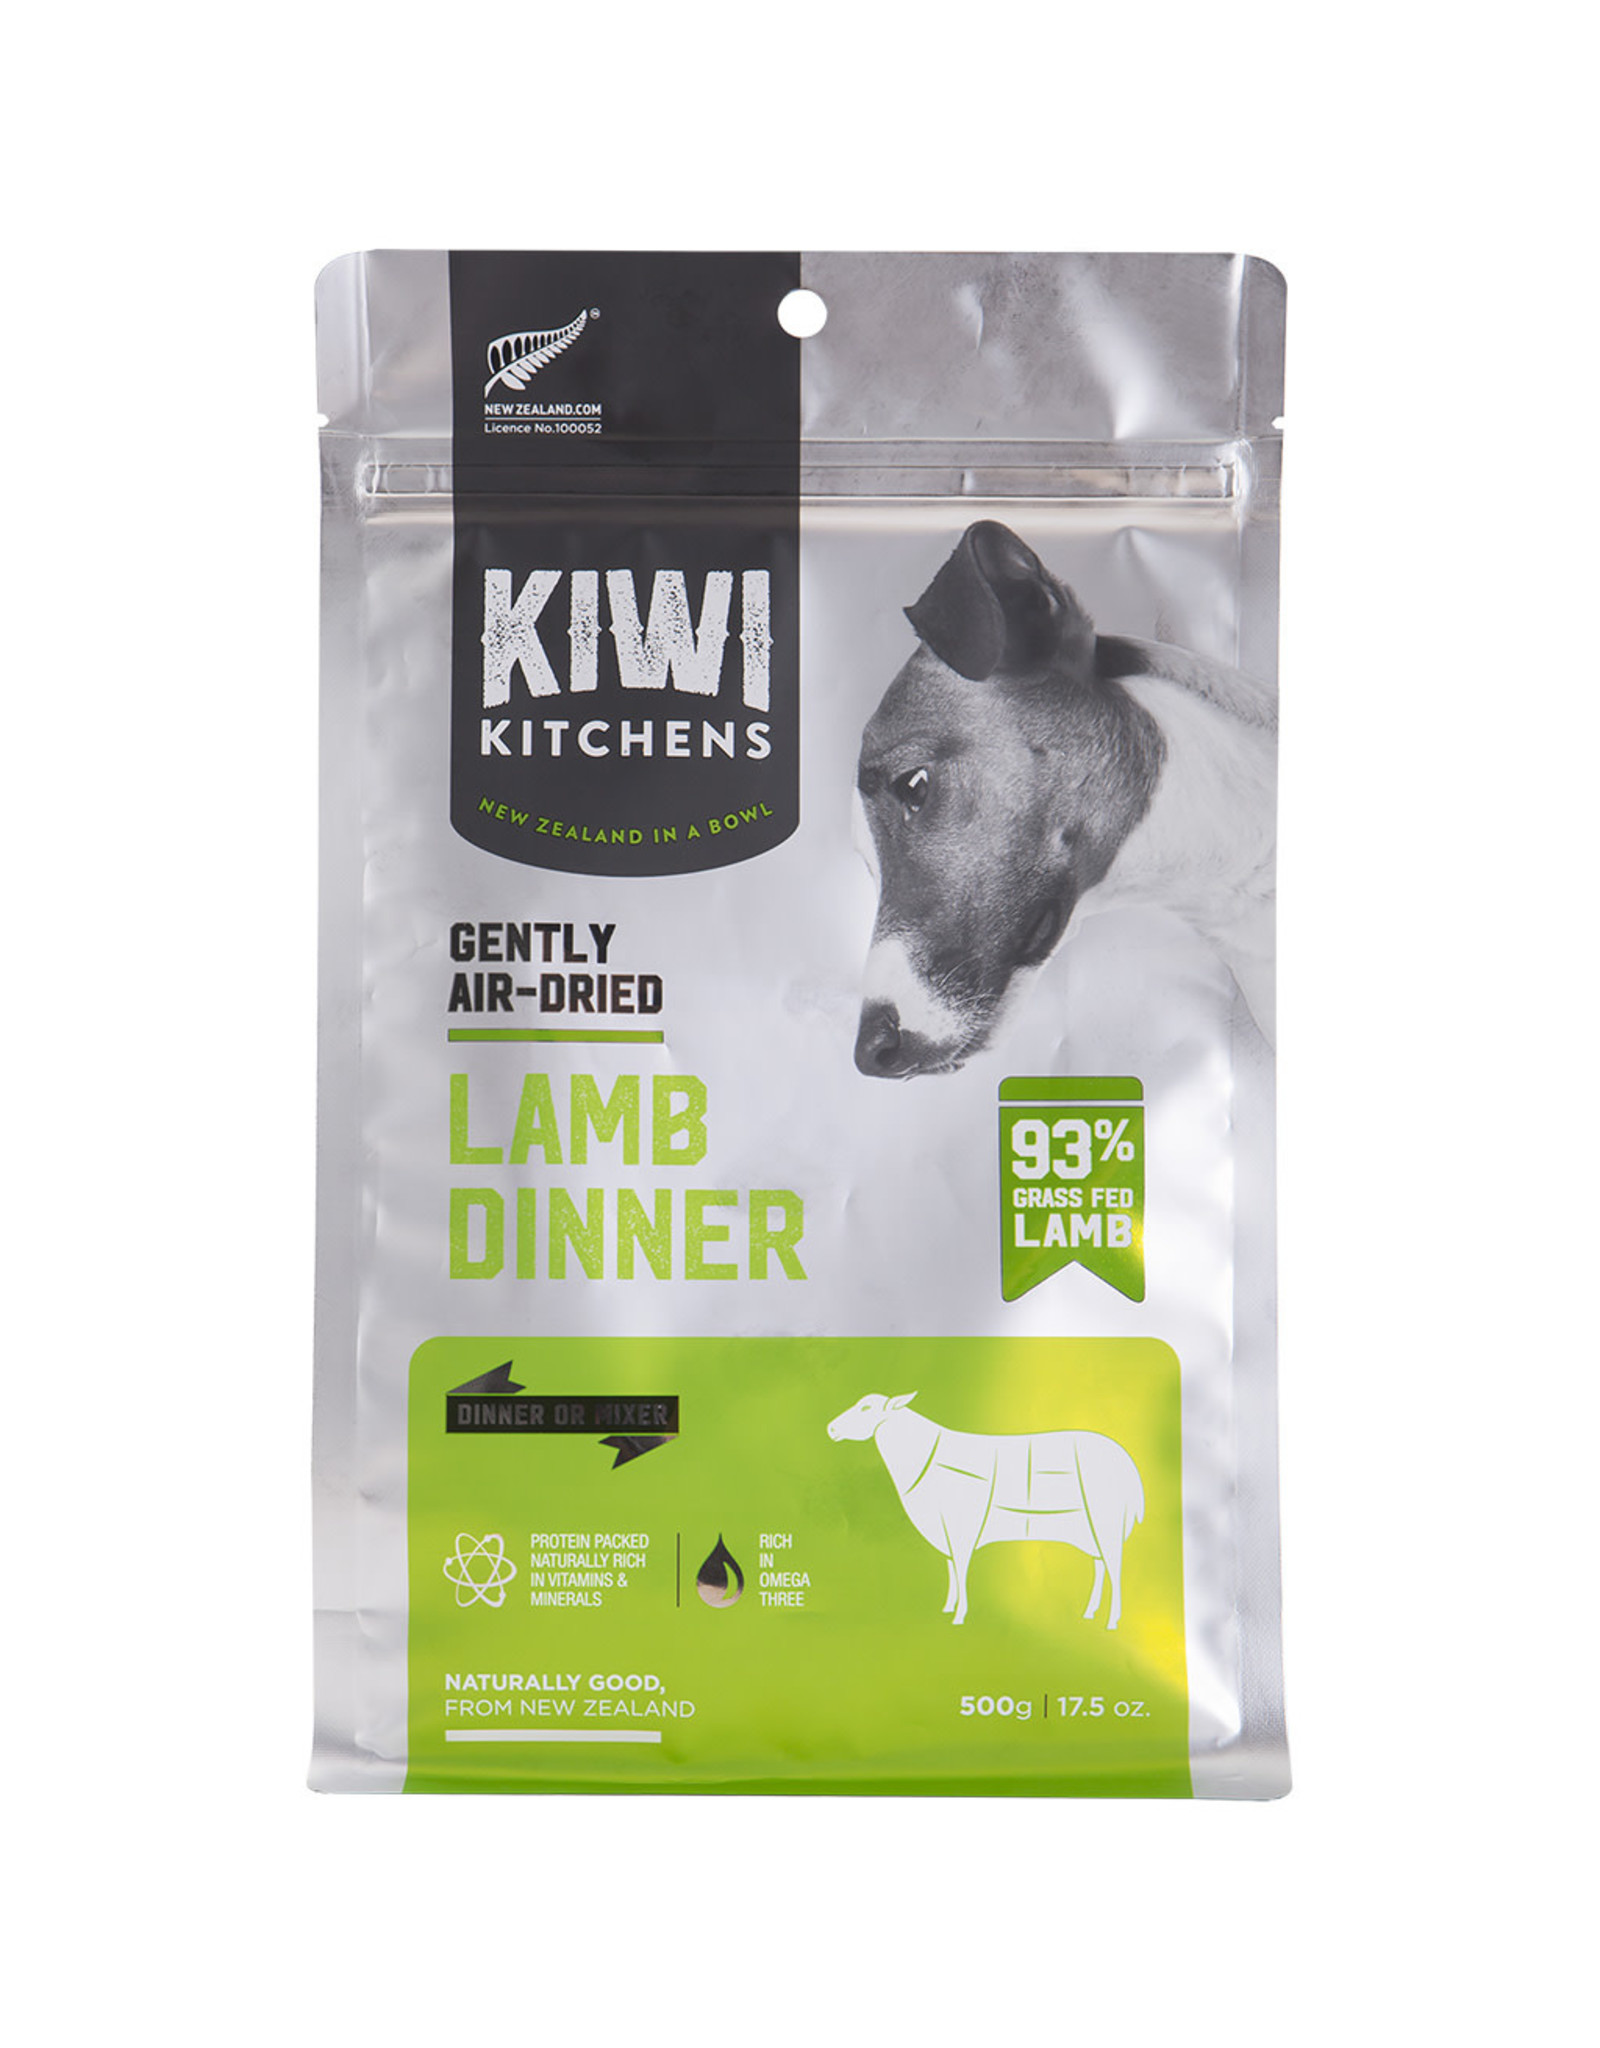 Kiwi Kitchens Kiwi Kitchens Gently Air-Dried Lamb Dinner [DOG]